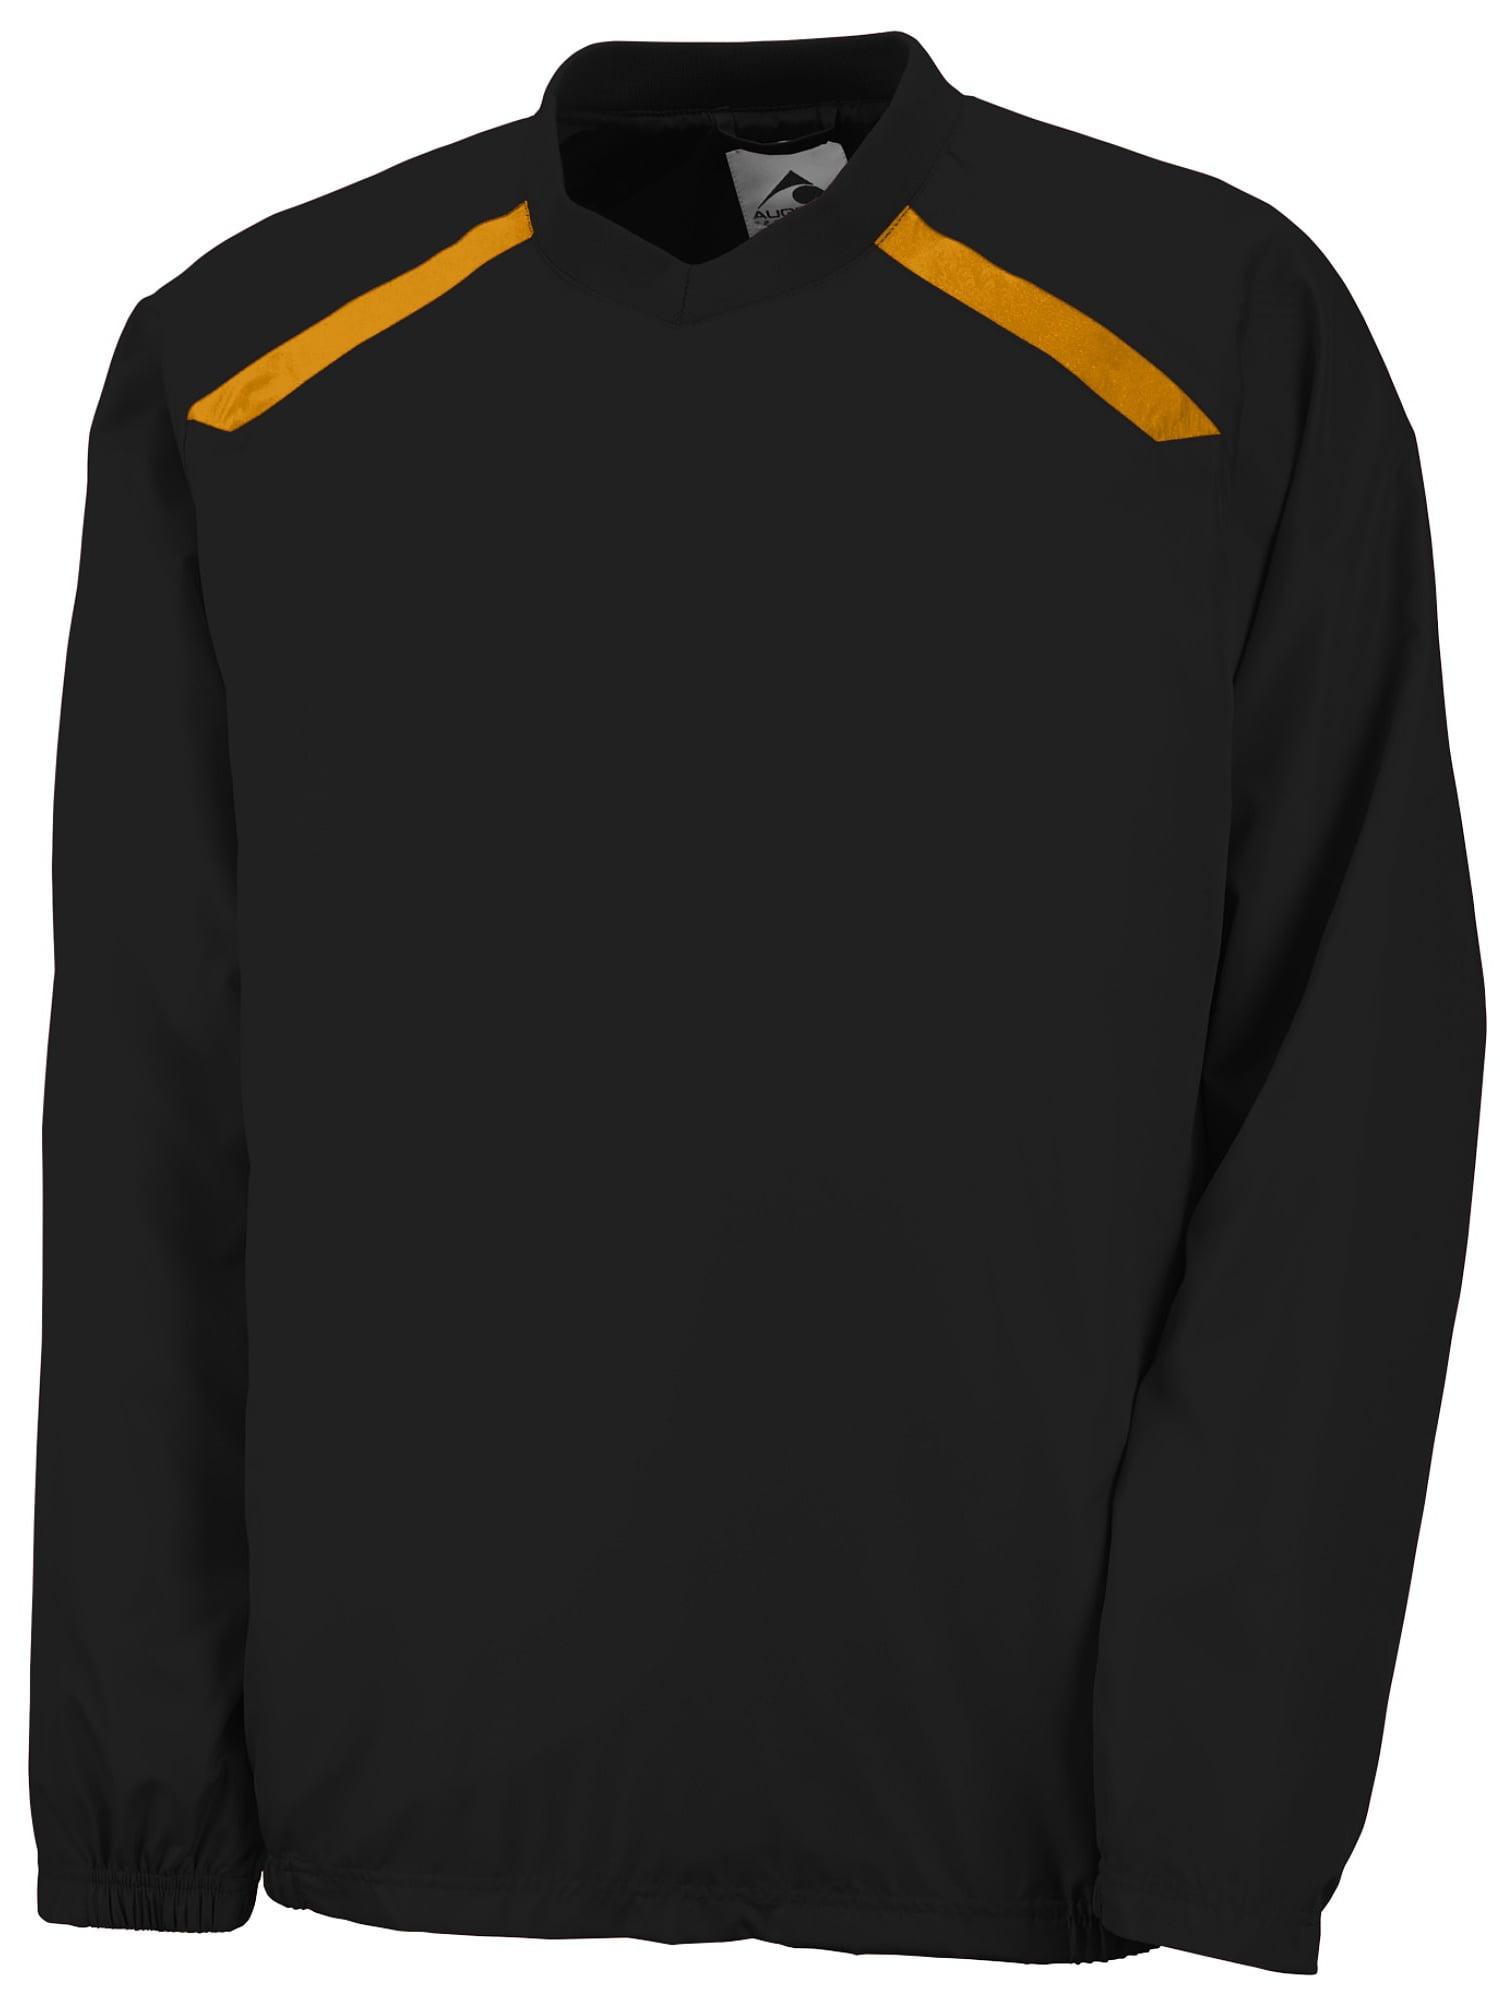 Augusta Sportswear AG3417 Promentum Pullover Wind Shirt Men's